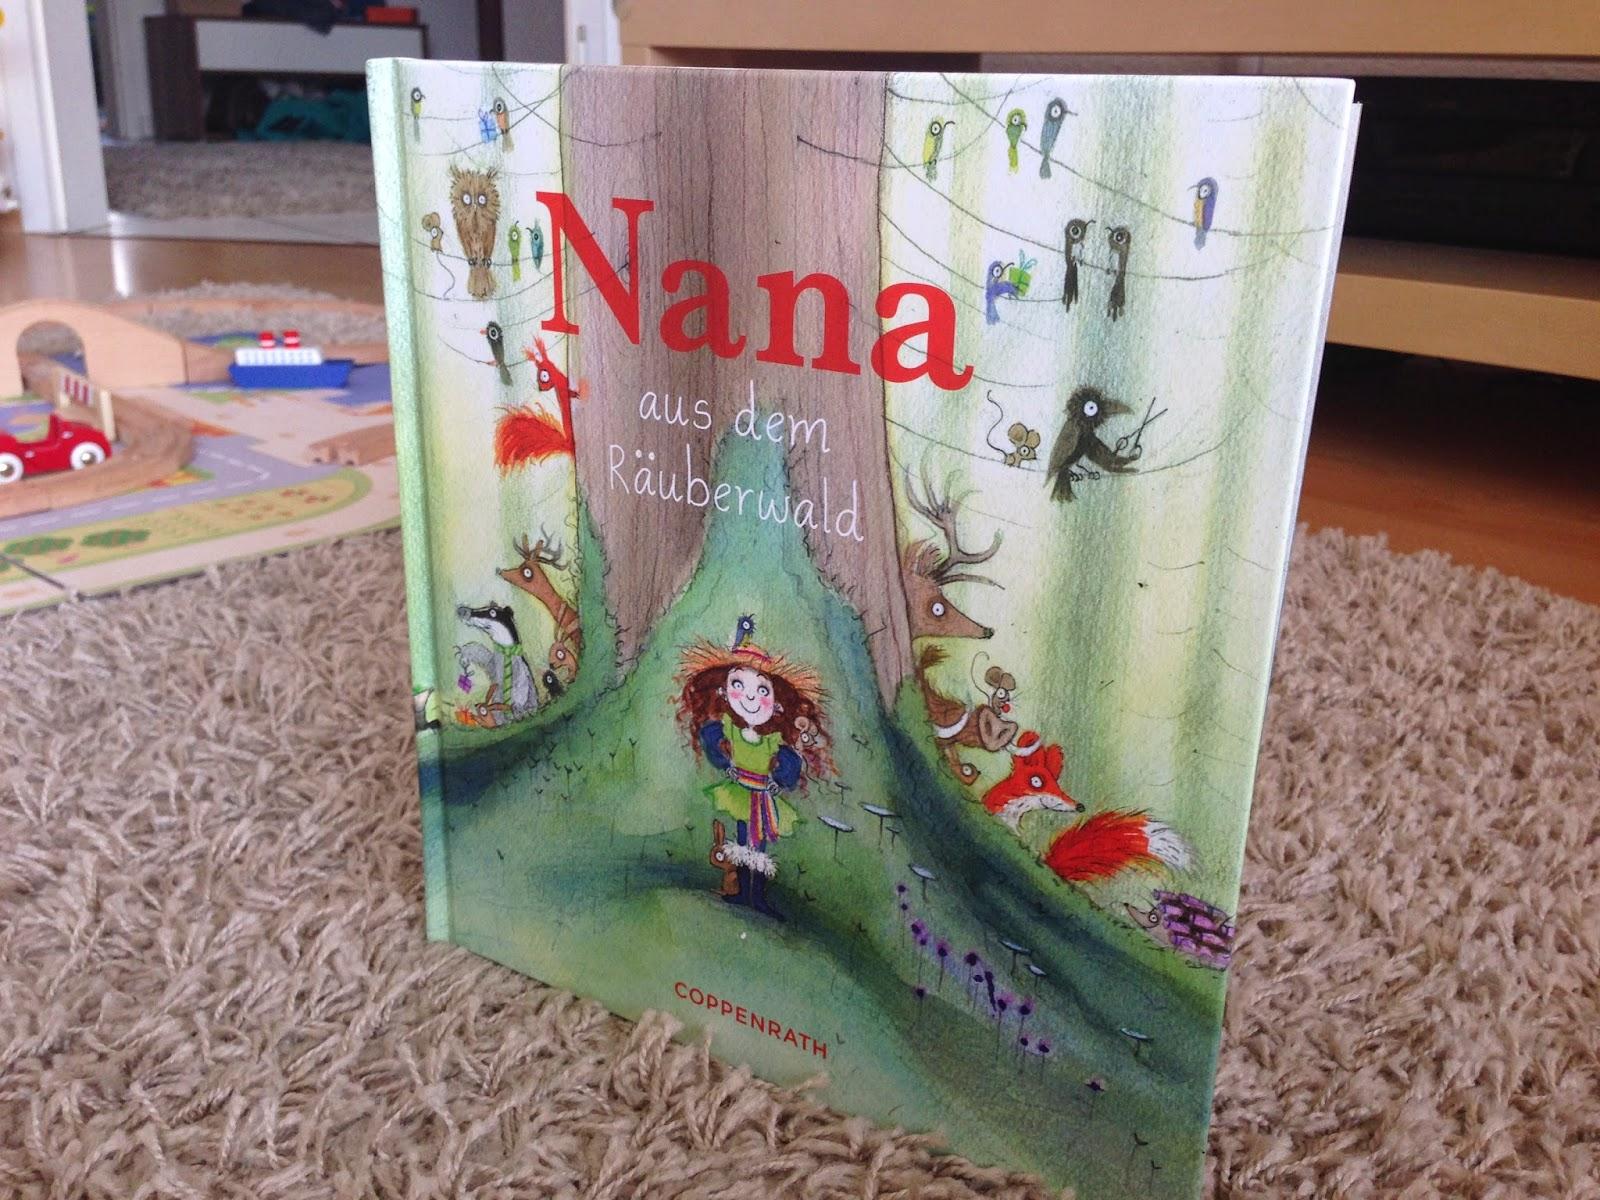 Nana aus dem Räuberwald\